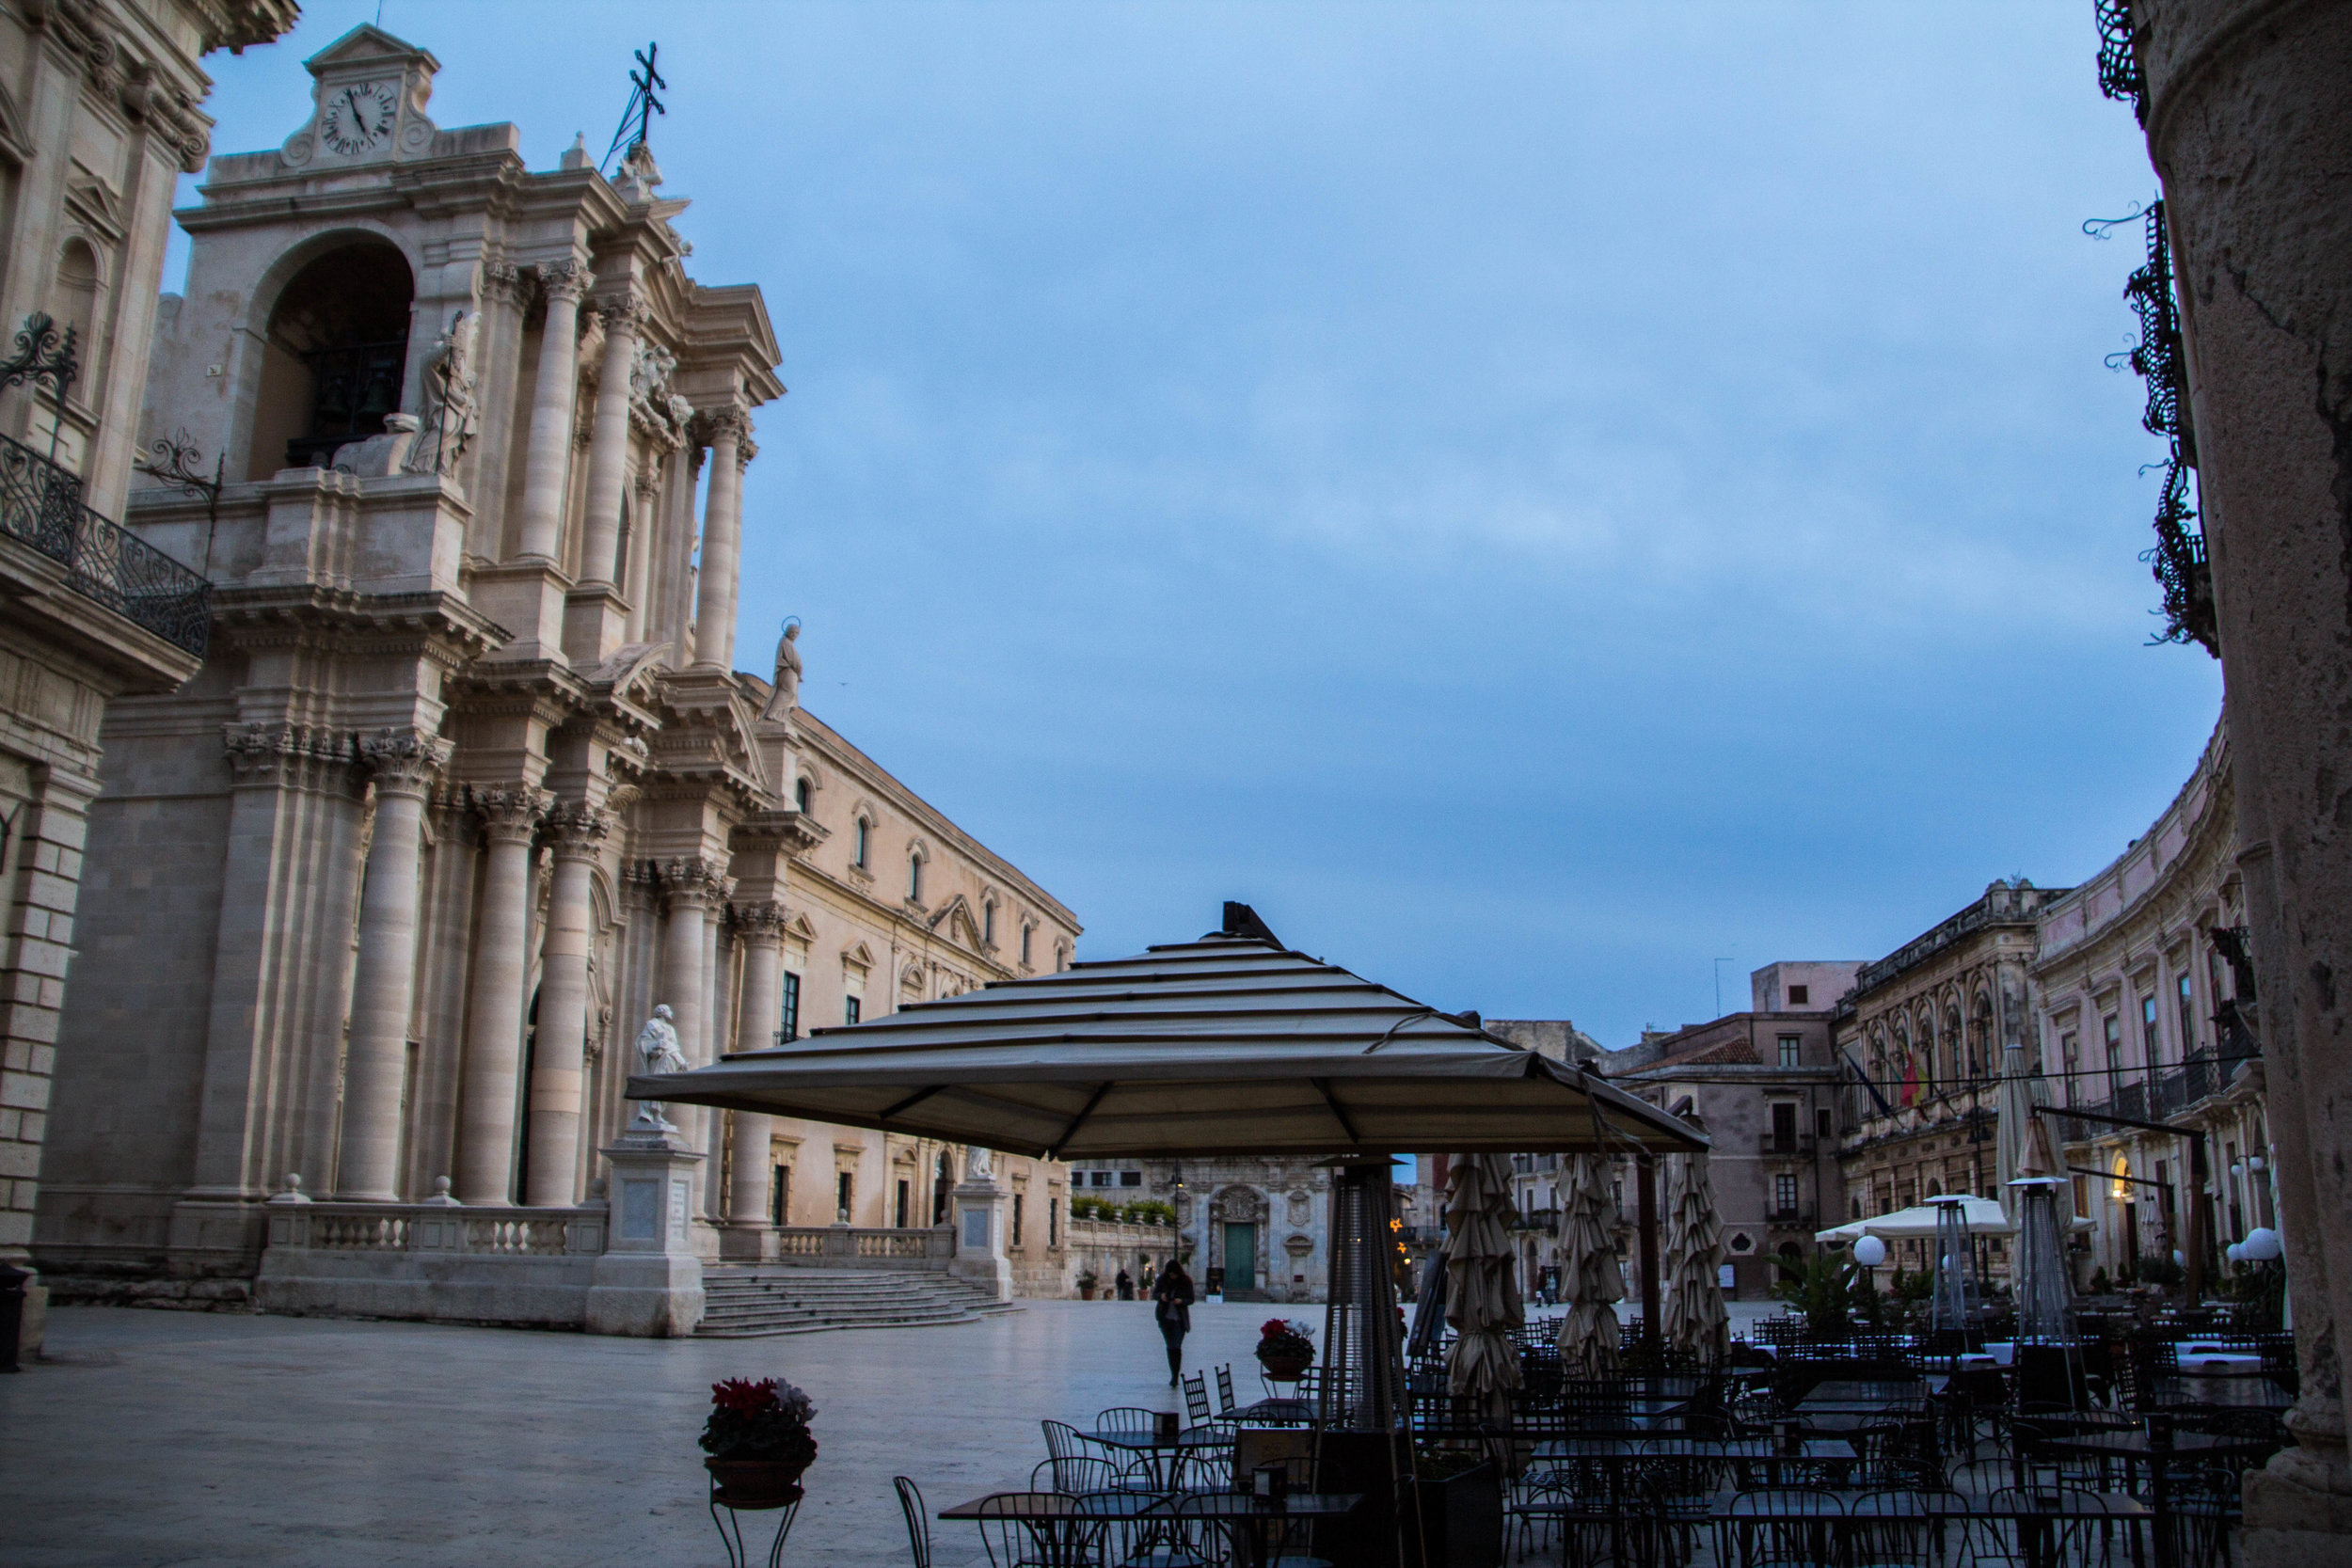 piazza-duomo-sunset-ortygia-syracuse-sicily-6.jpg